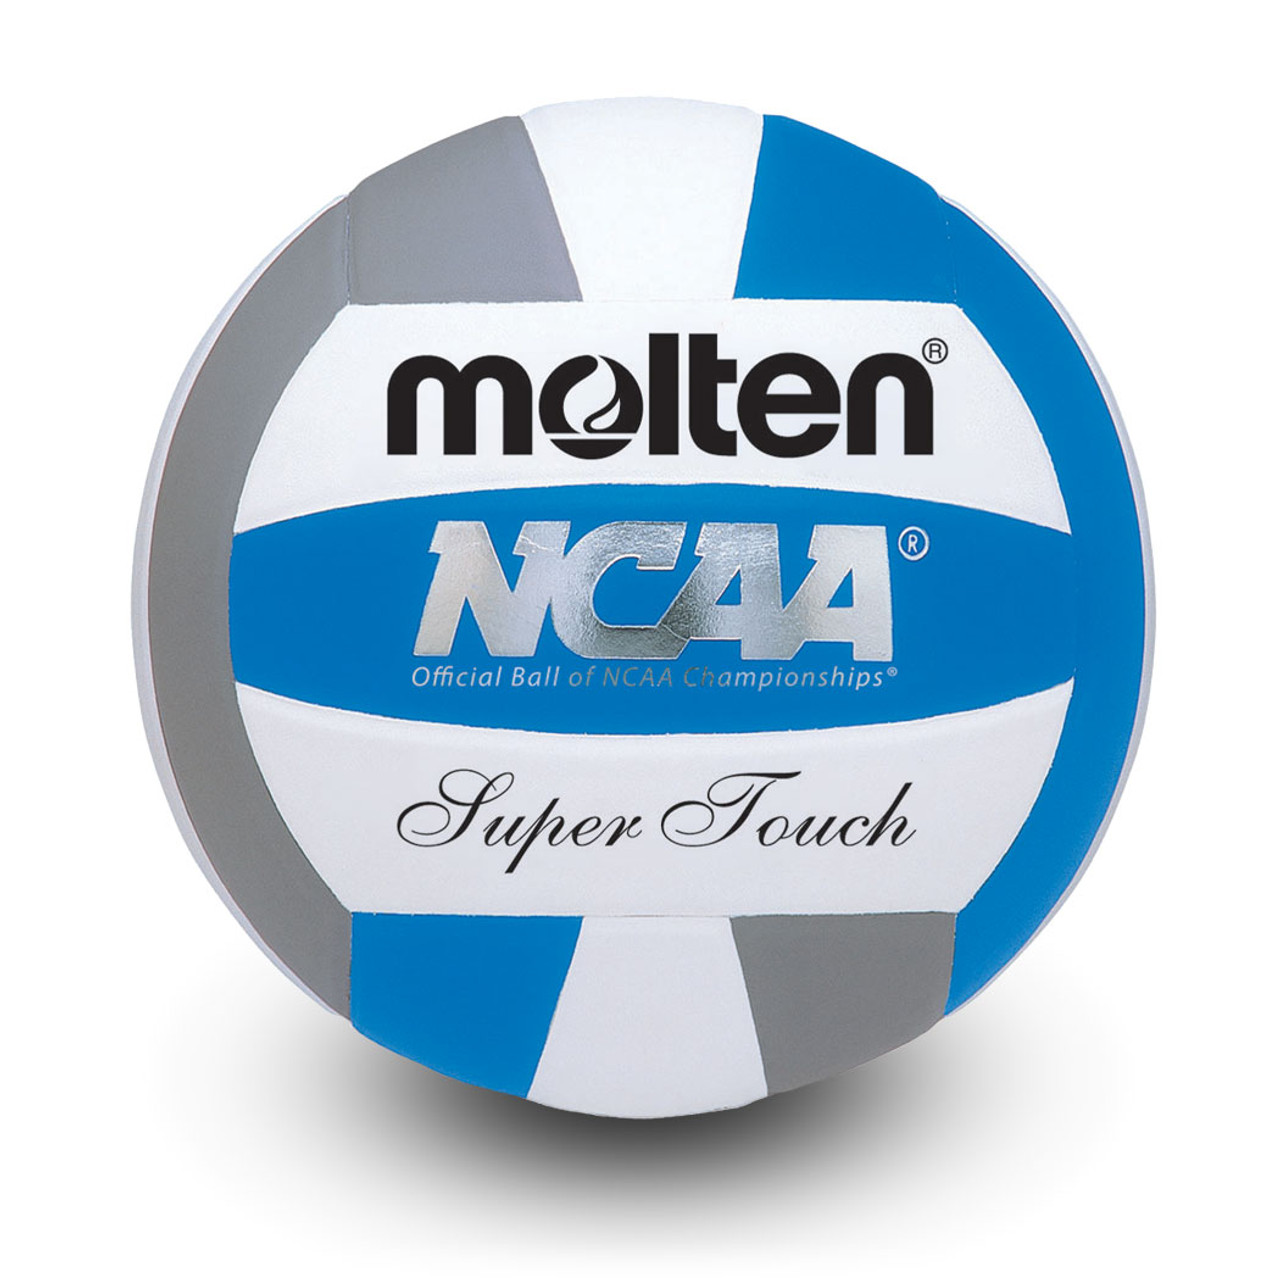 ncaa super touch volleyball molten usa